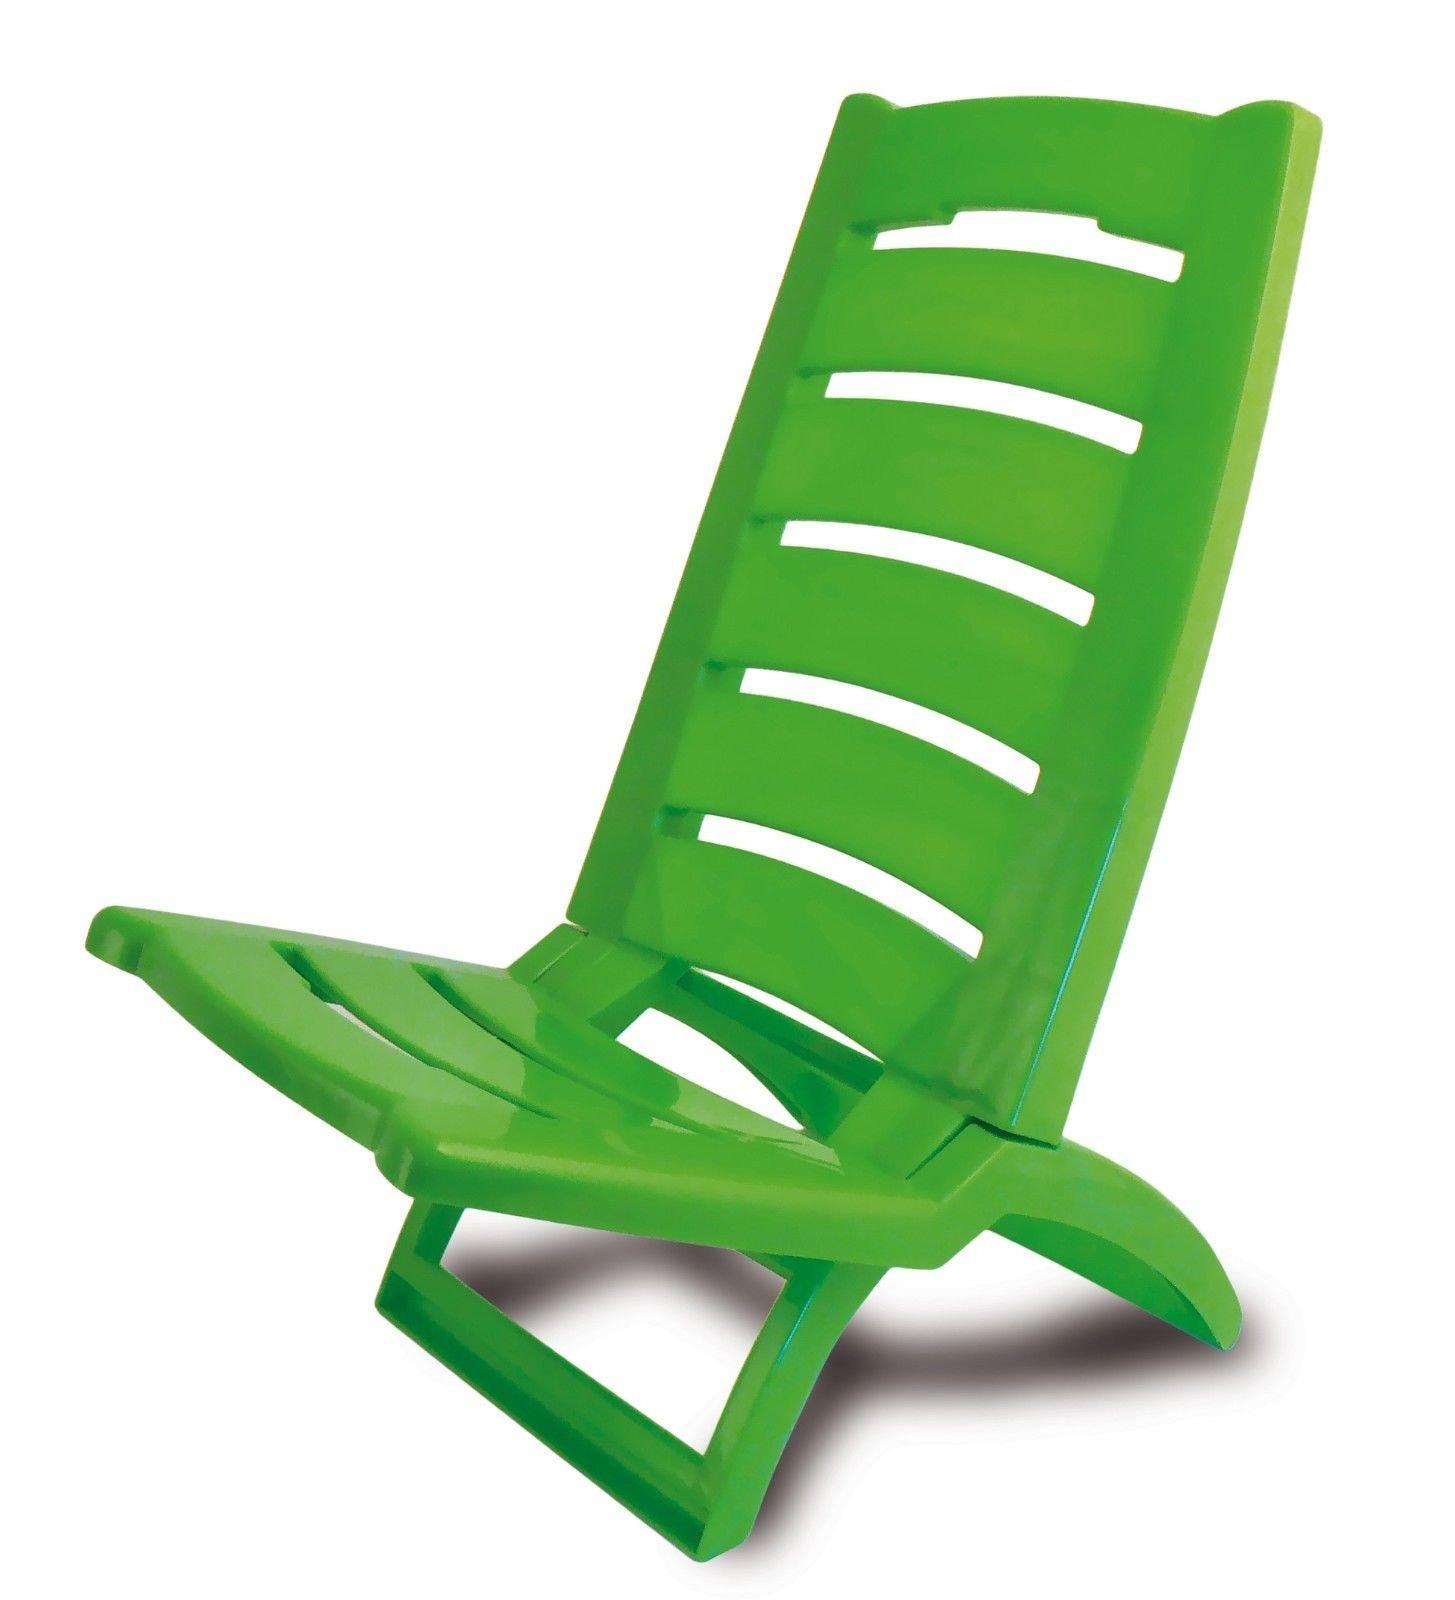 ADRIATIC Beach Chair Coloured Folding Plastic Low Deck Chair Sun Garden Sea Side (Dark Green - Set Of 2)